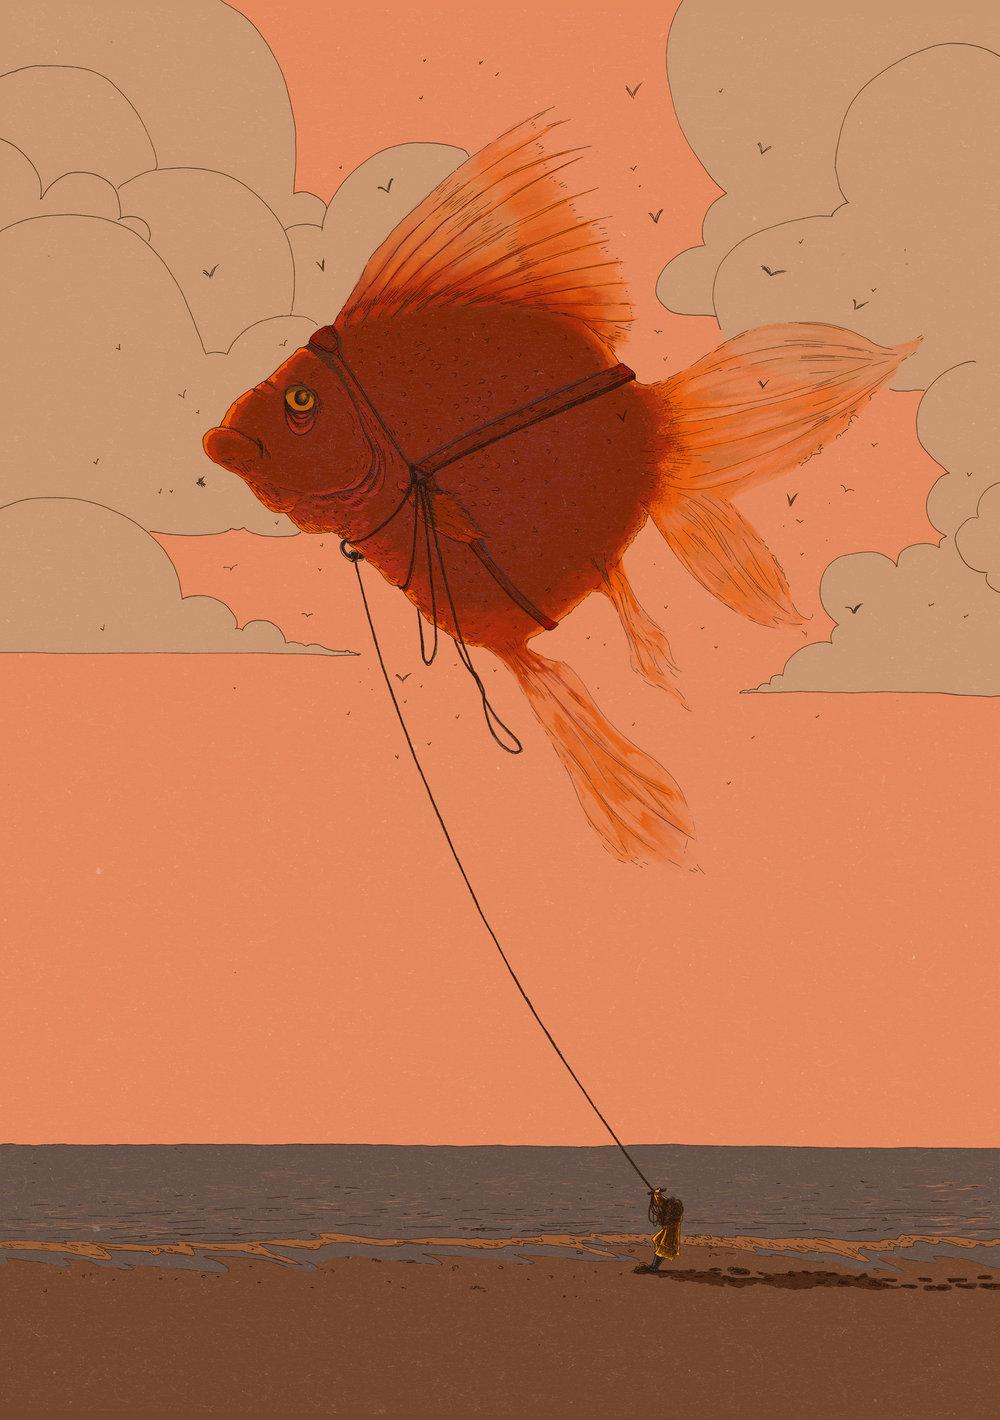 goldfish_1.1.jpg